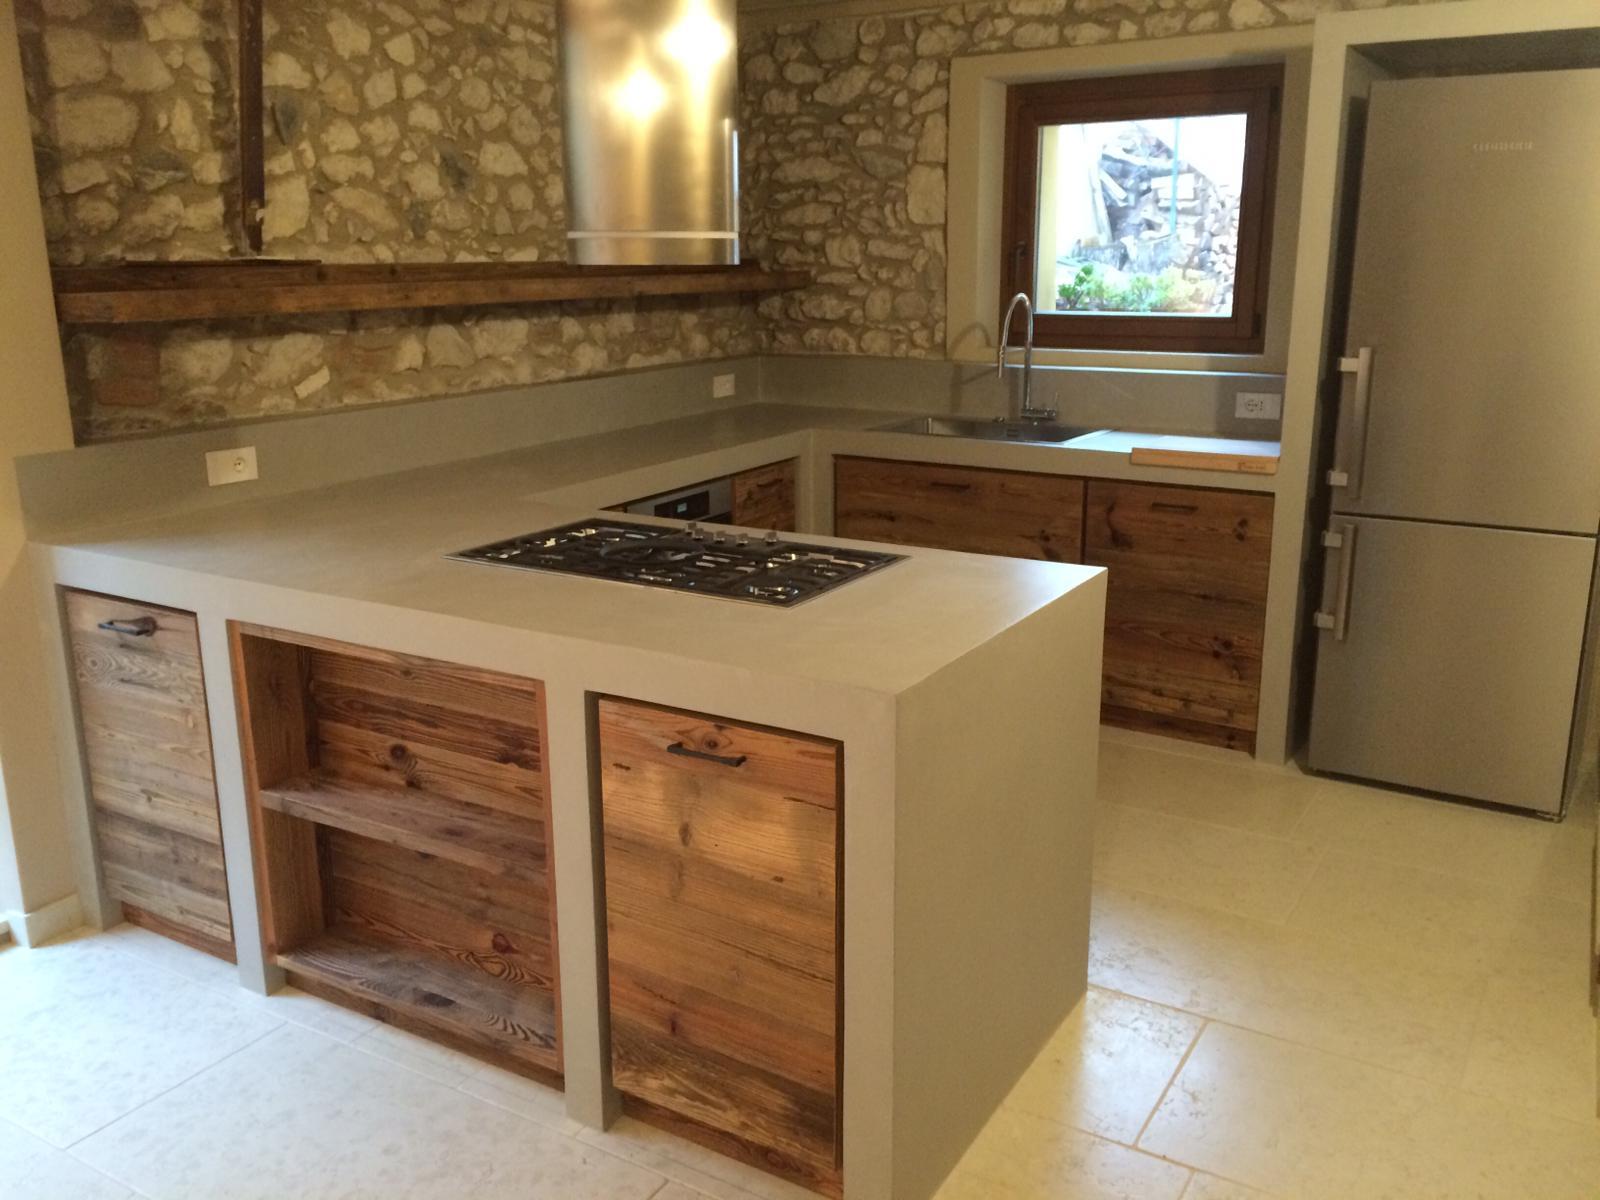 Forno Cucina In Muratura cucina in muratura moderna art. 254 | fadini mobili cerea verona